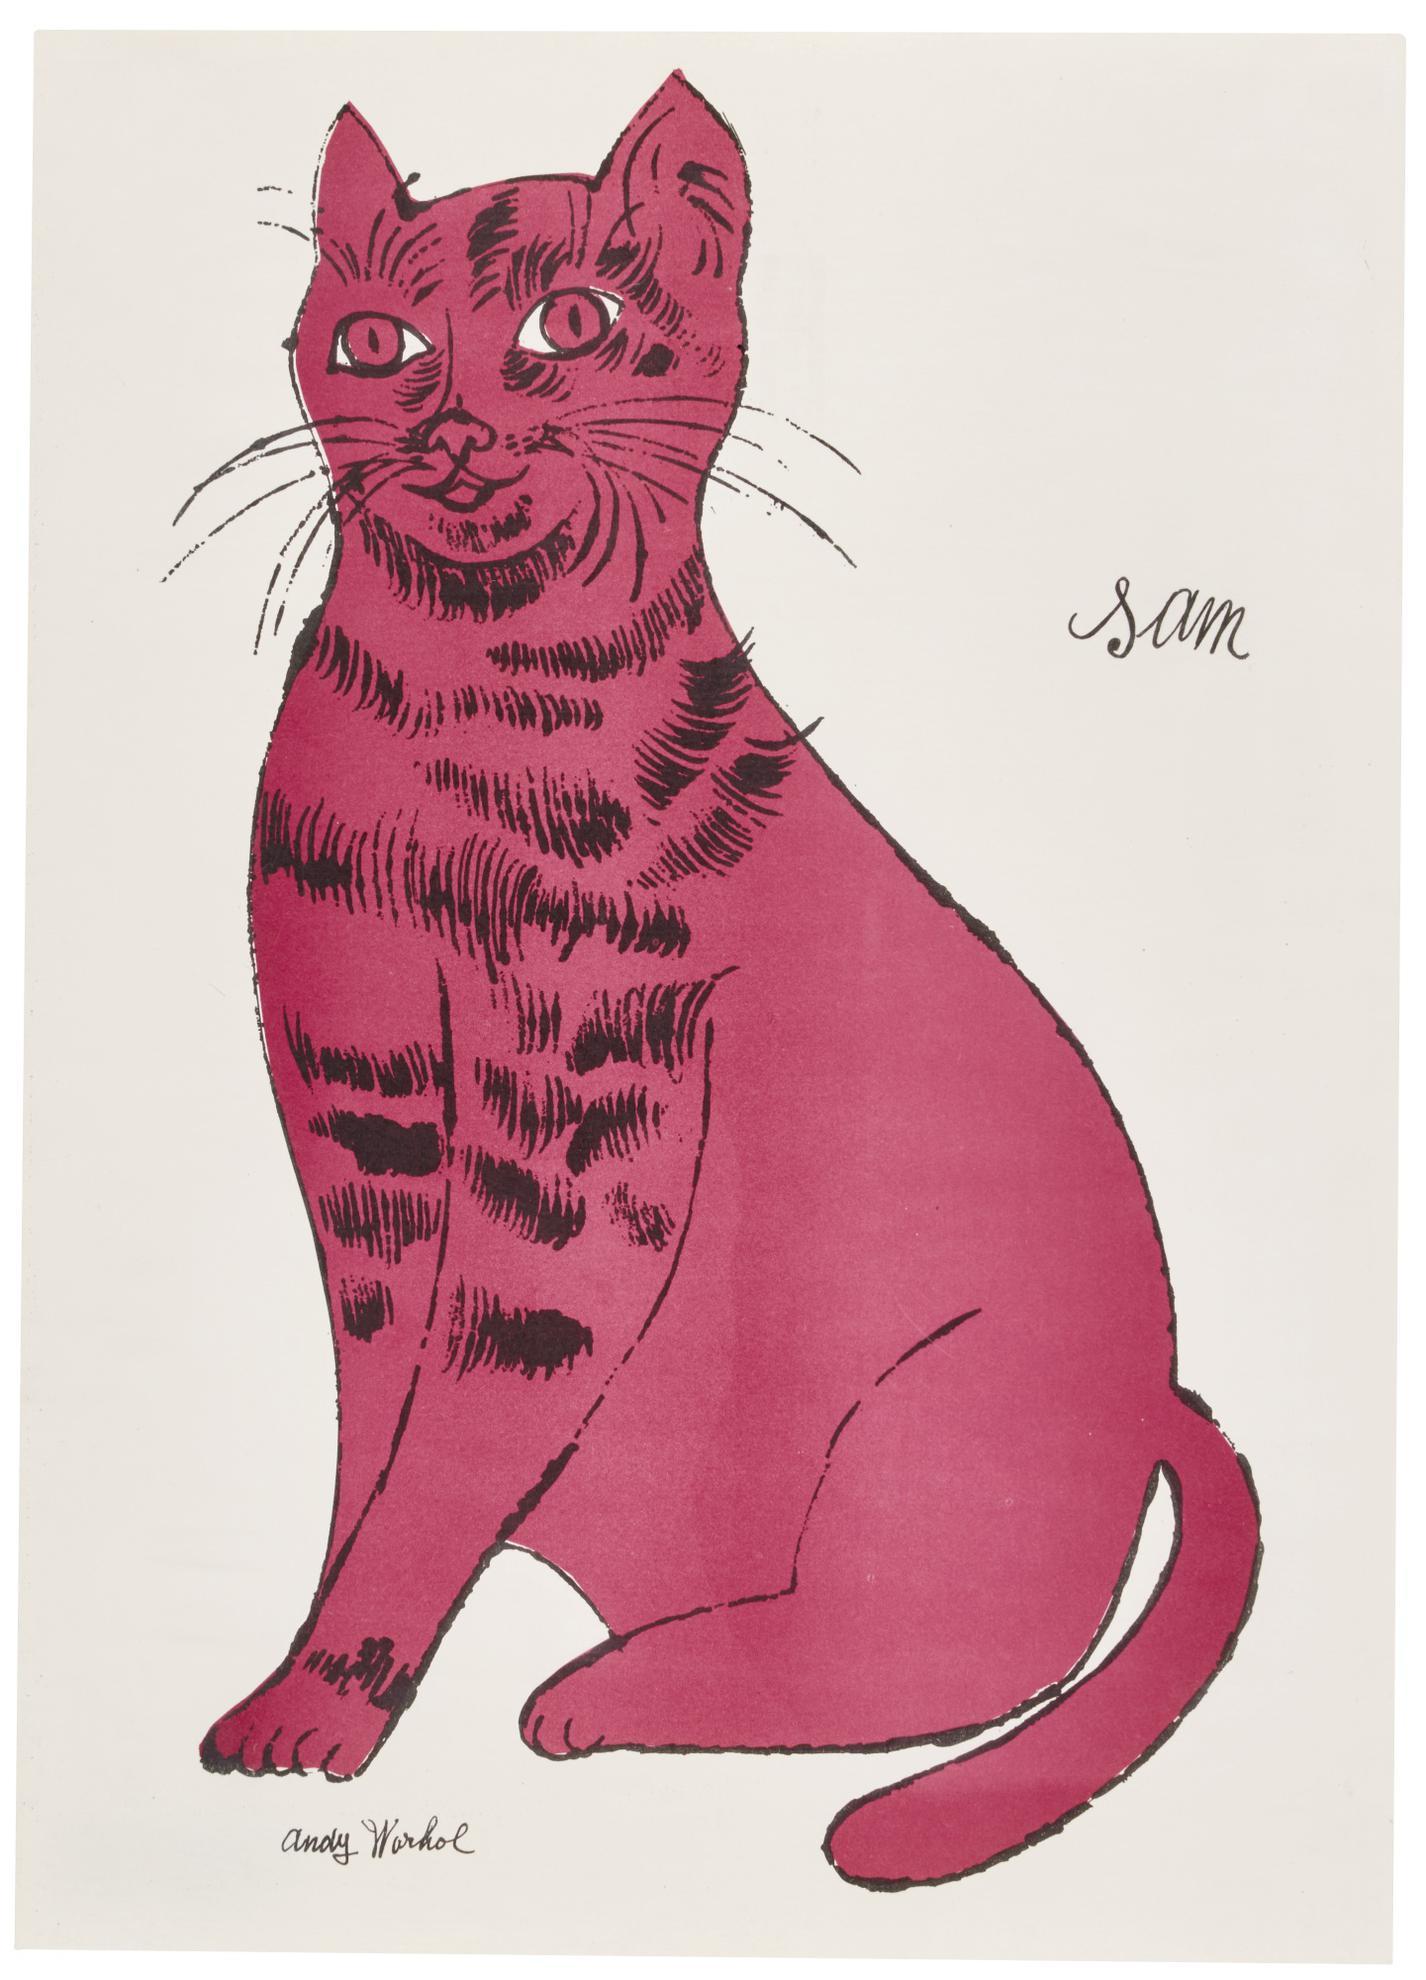 Andy Warhol-Sam (F. & S. IV.51)-1954